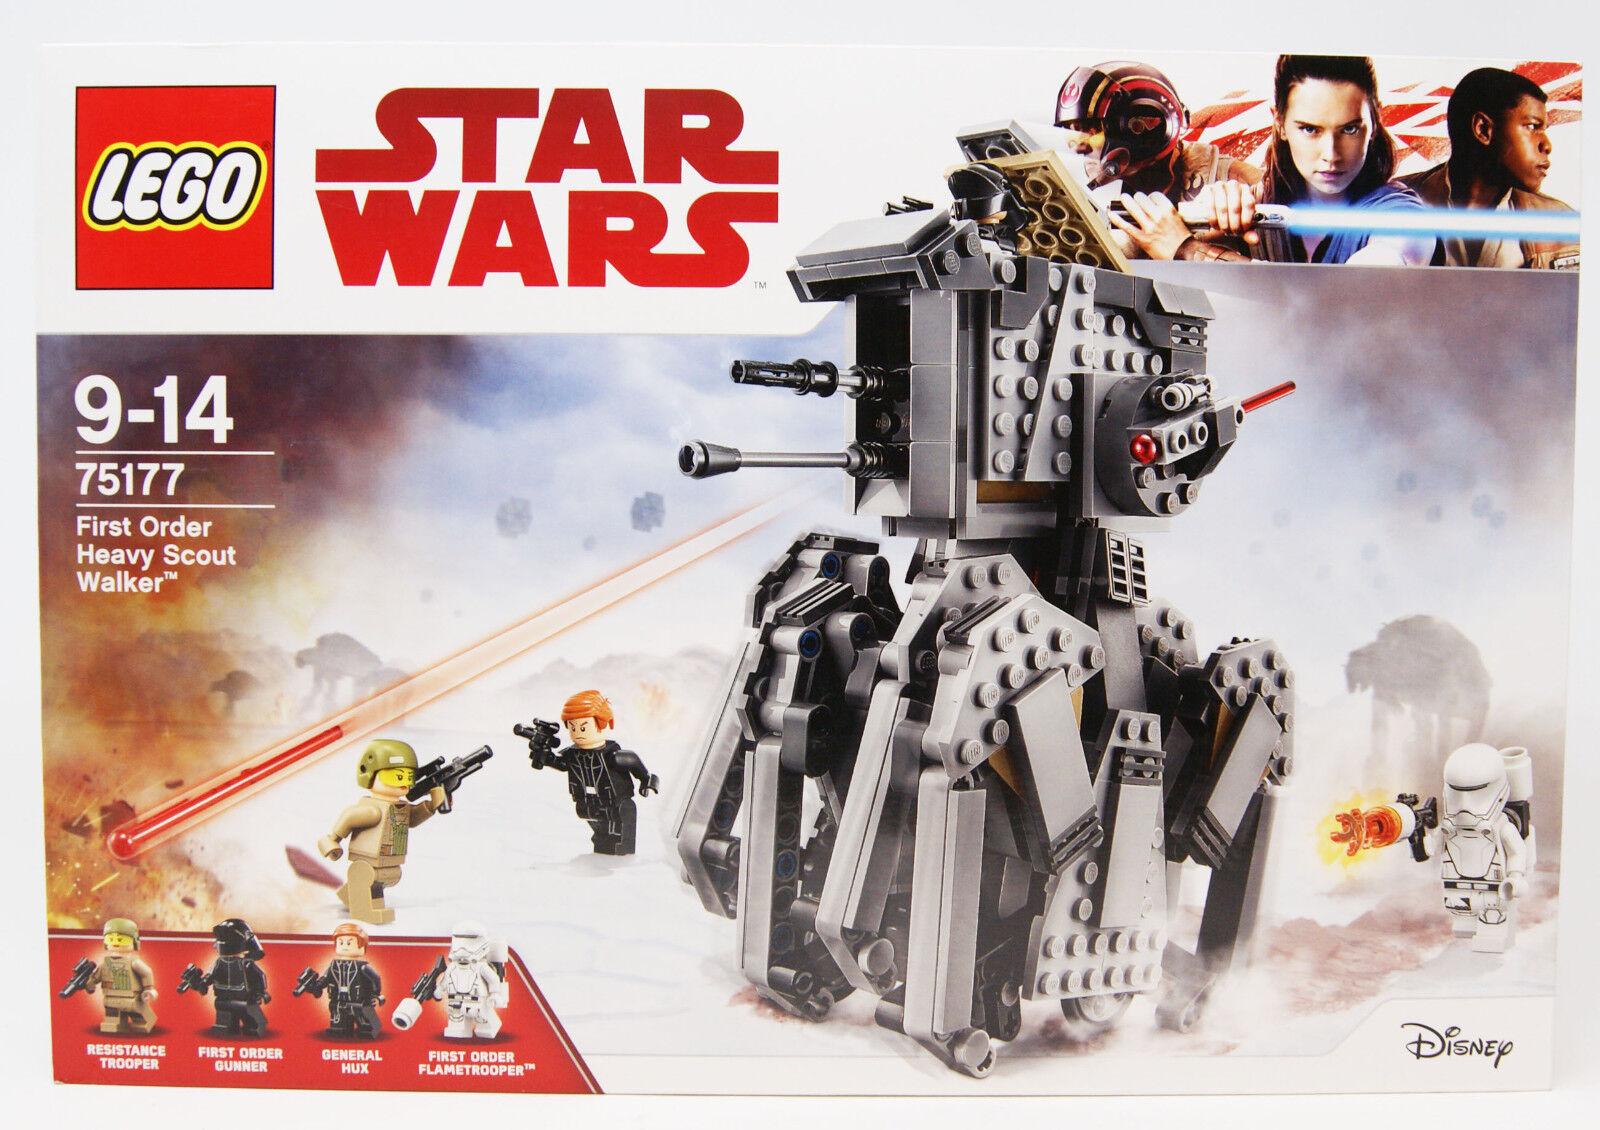 Lego - 75177 - Star Wars - First Order Heavy Scout Walker - 554 Teile